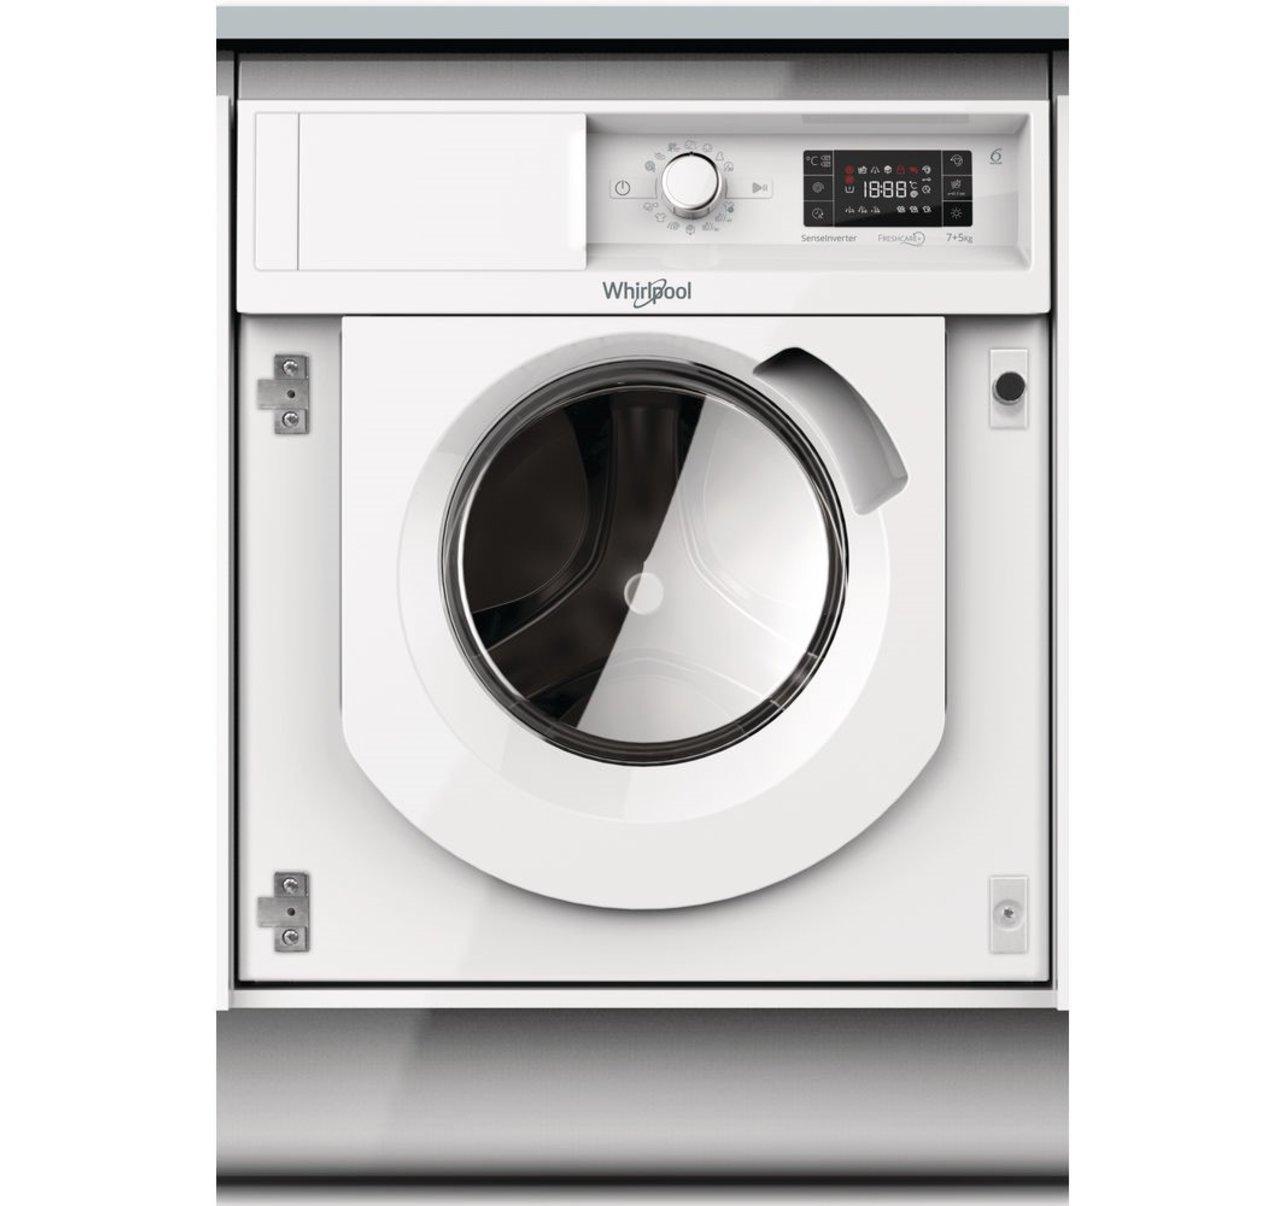 Whirlpool BI WDWG 75148 EU